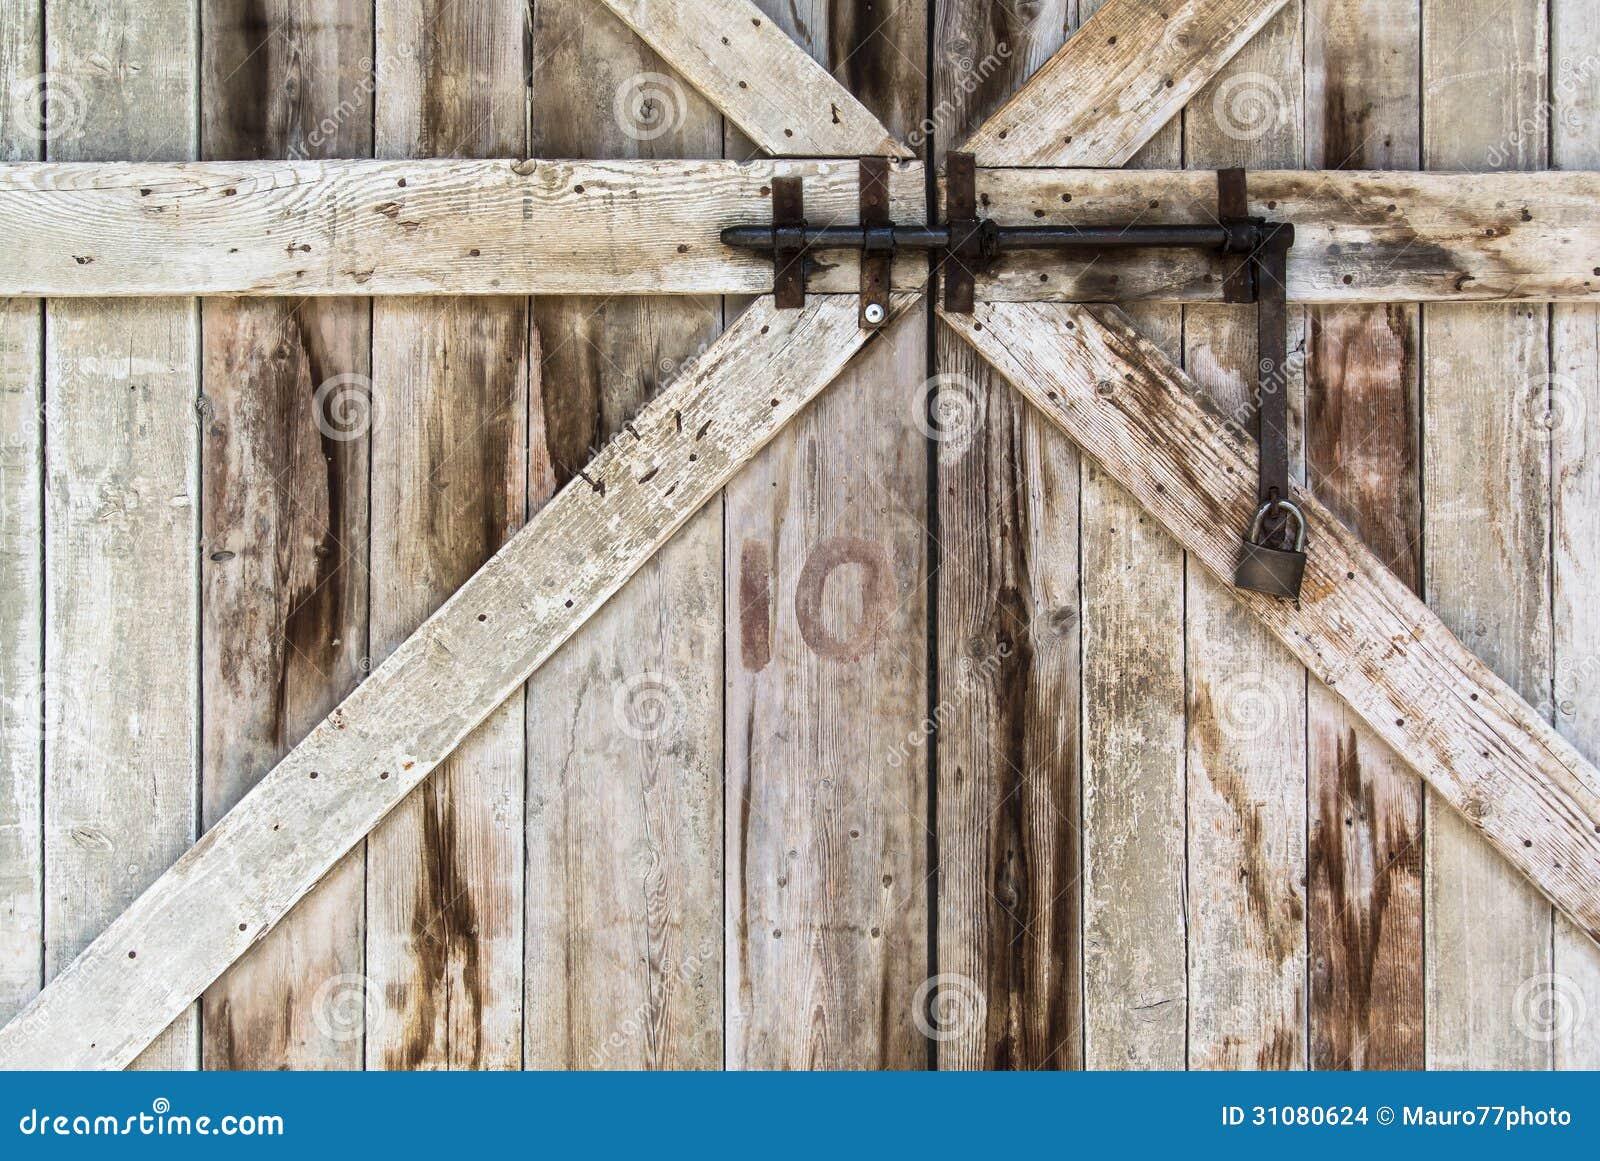 Locked Old Door Stock Photo Image Of Retro Lock Home 31080624